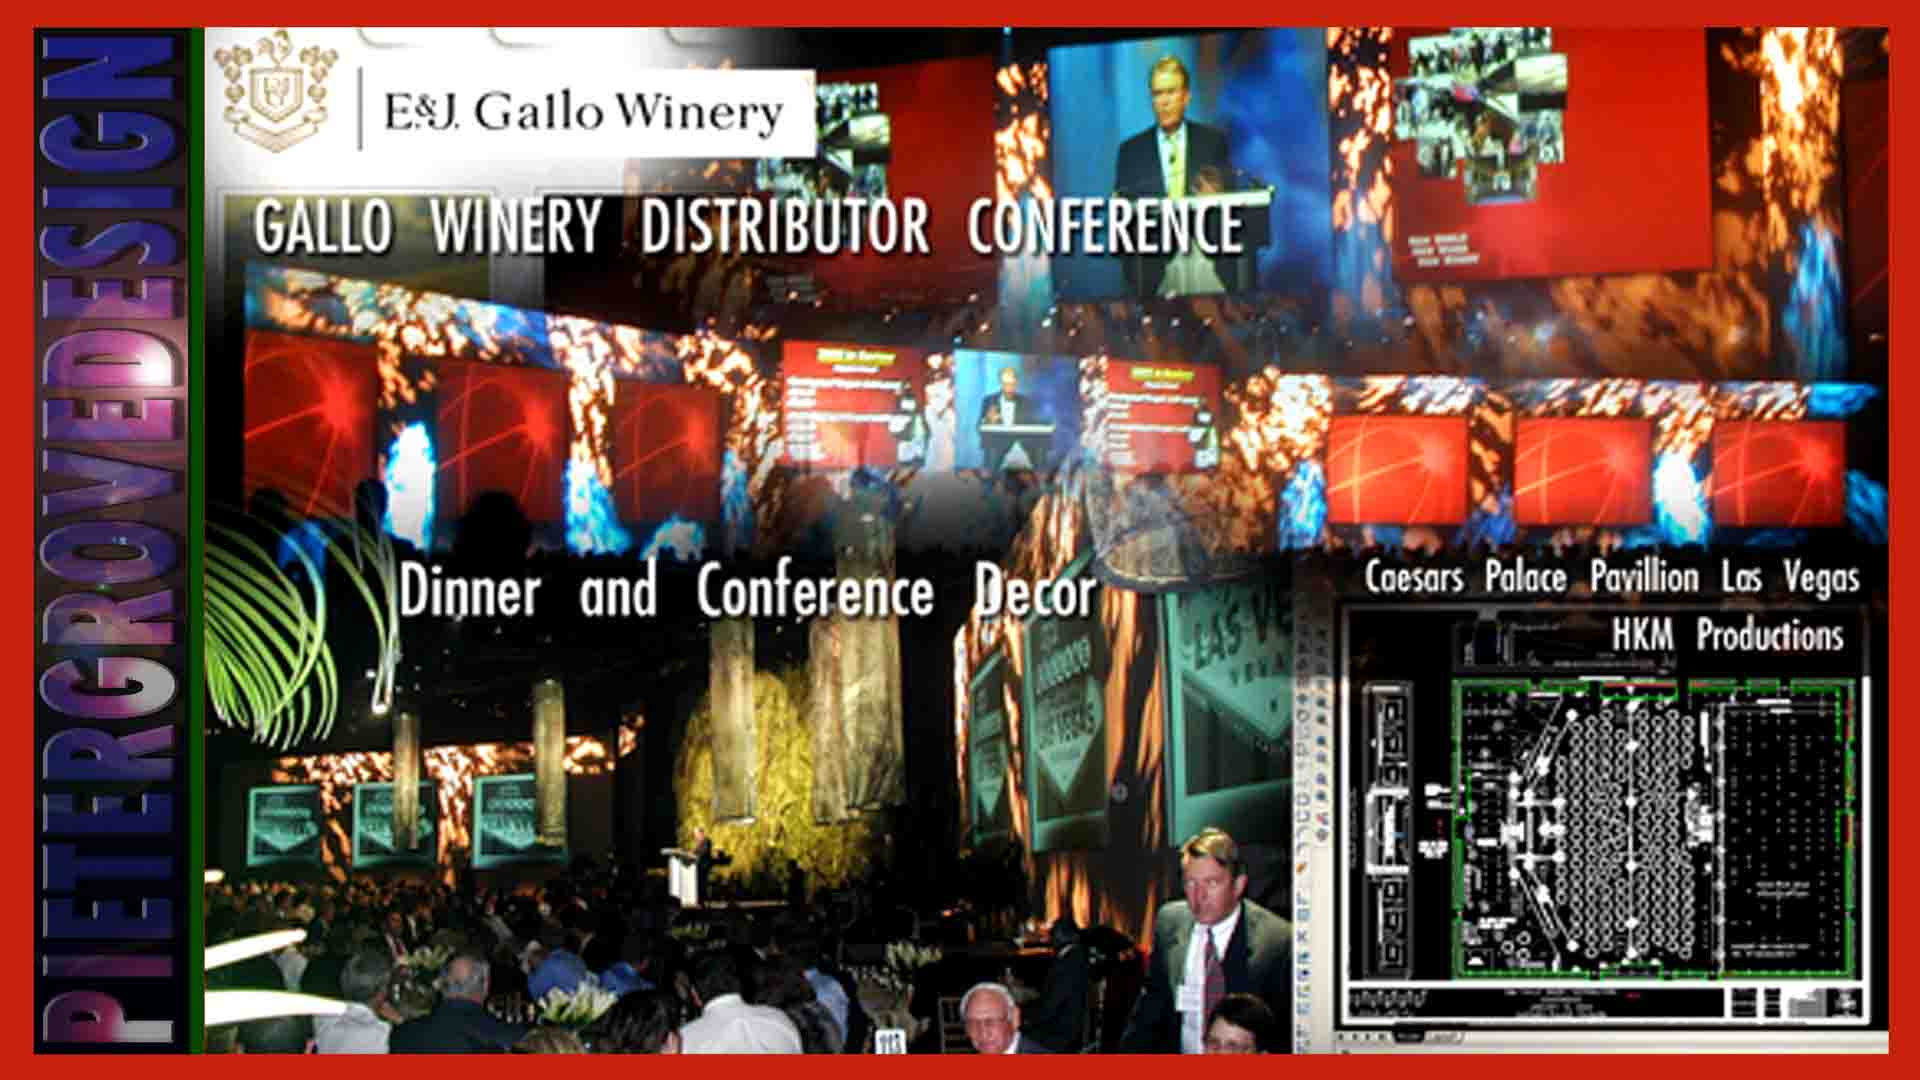 Scenic_EJGallo Winery _2000dpi